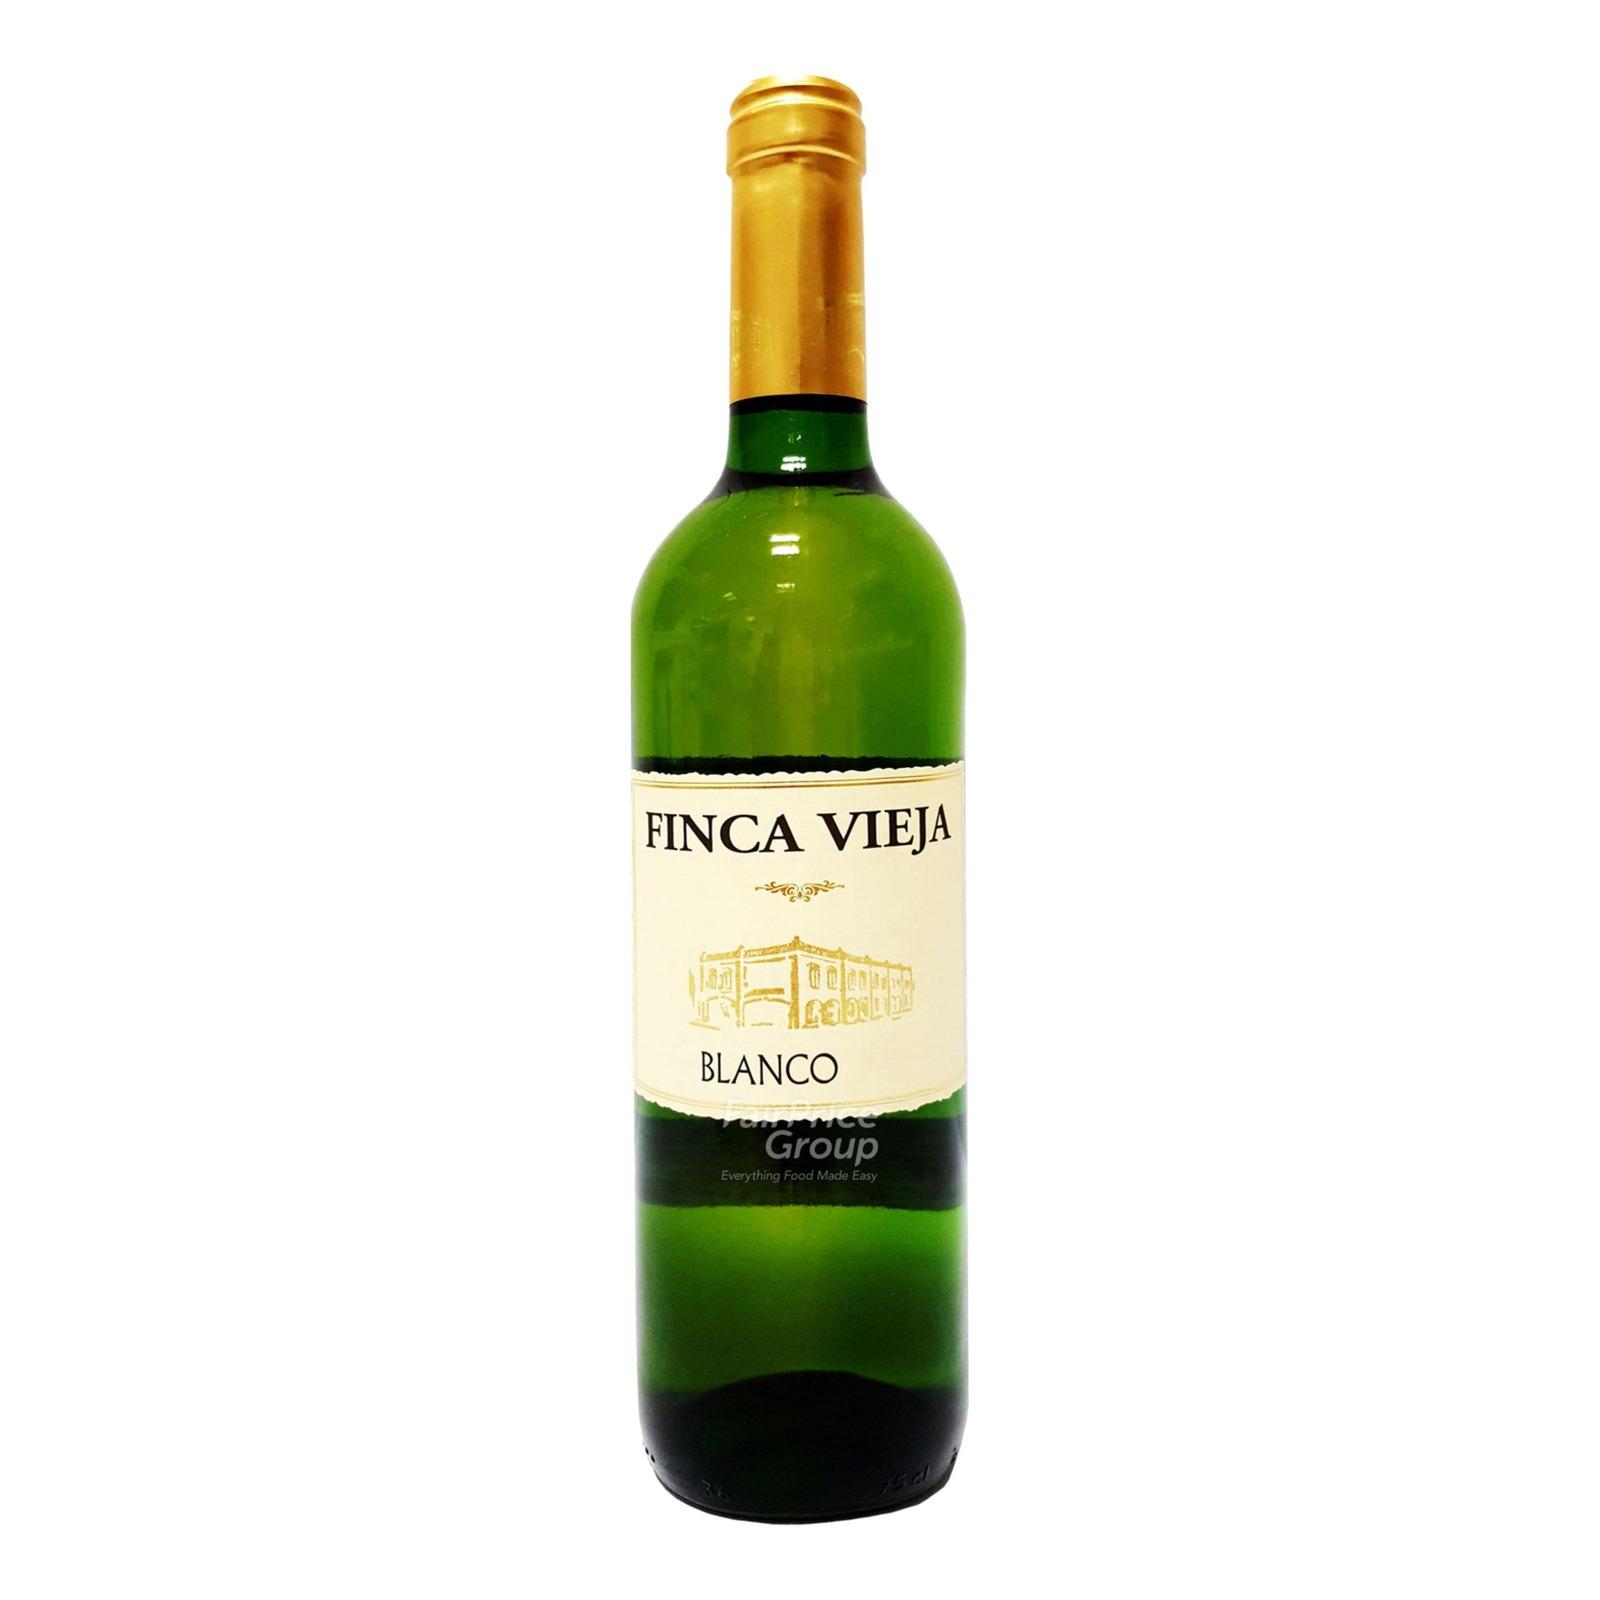 Finca Vieja White Wine - Blanco